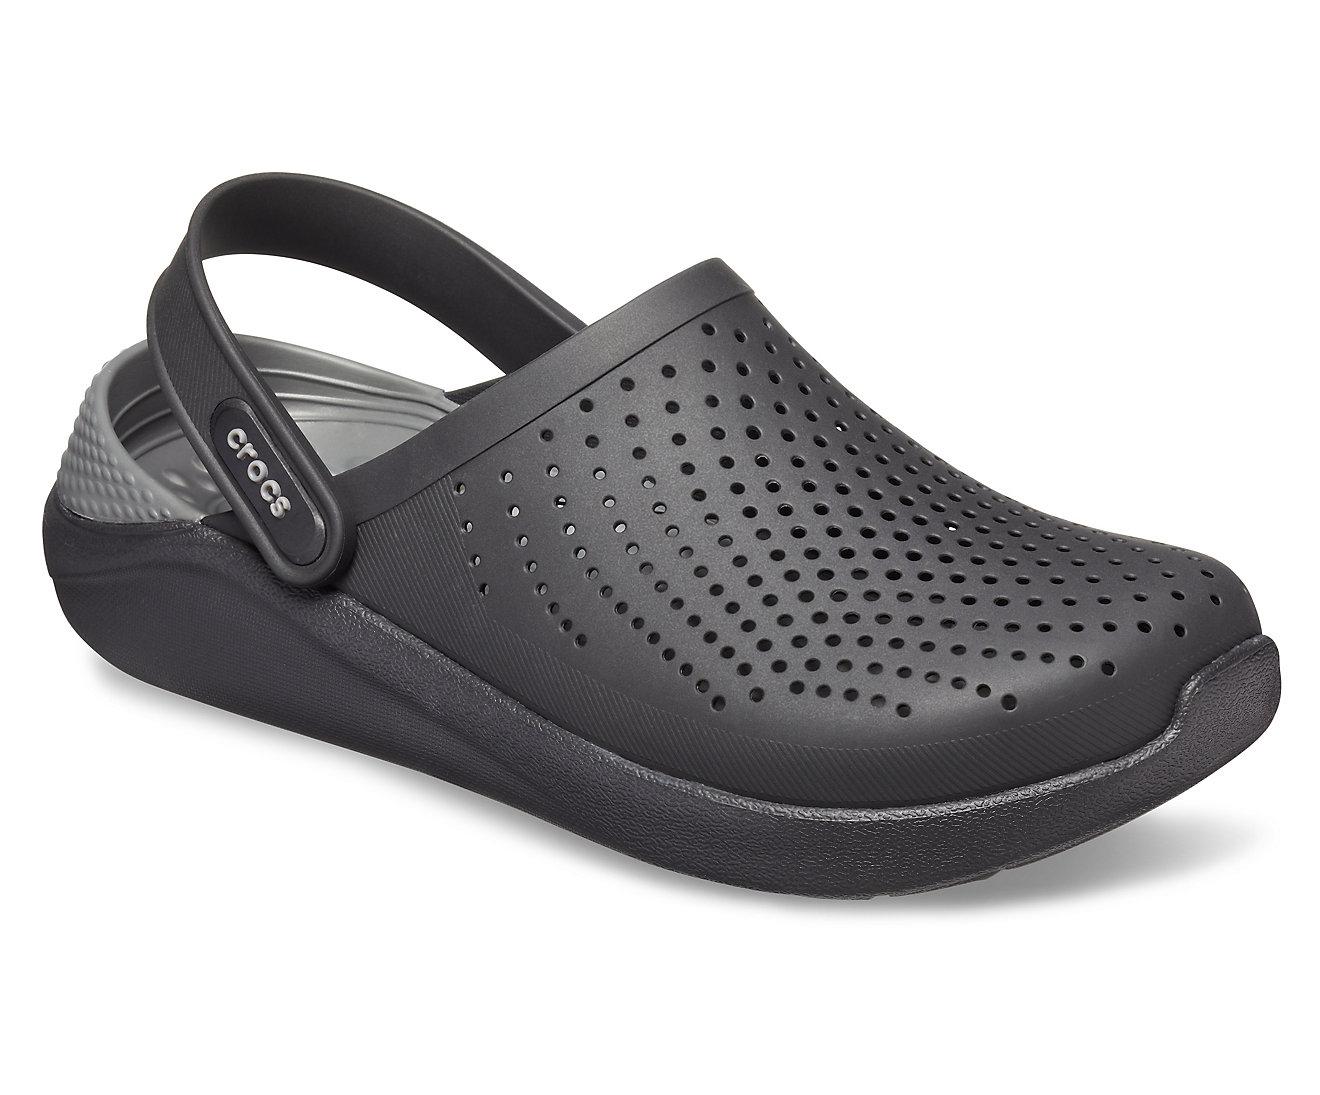 Chaussures médicales avec amorti Crocs LiteRide Clog